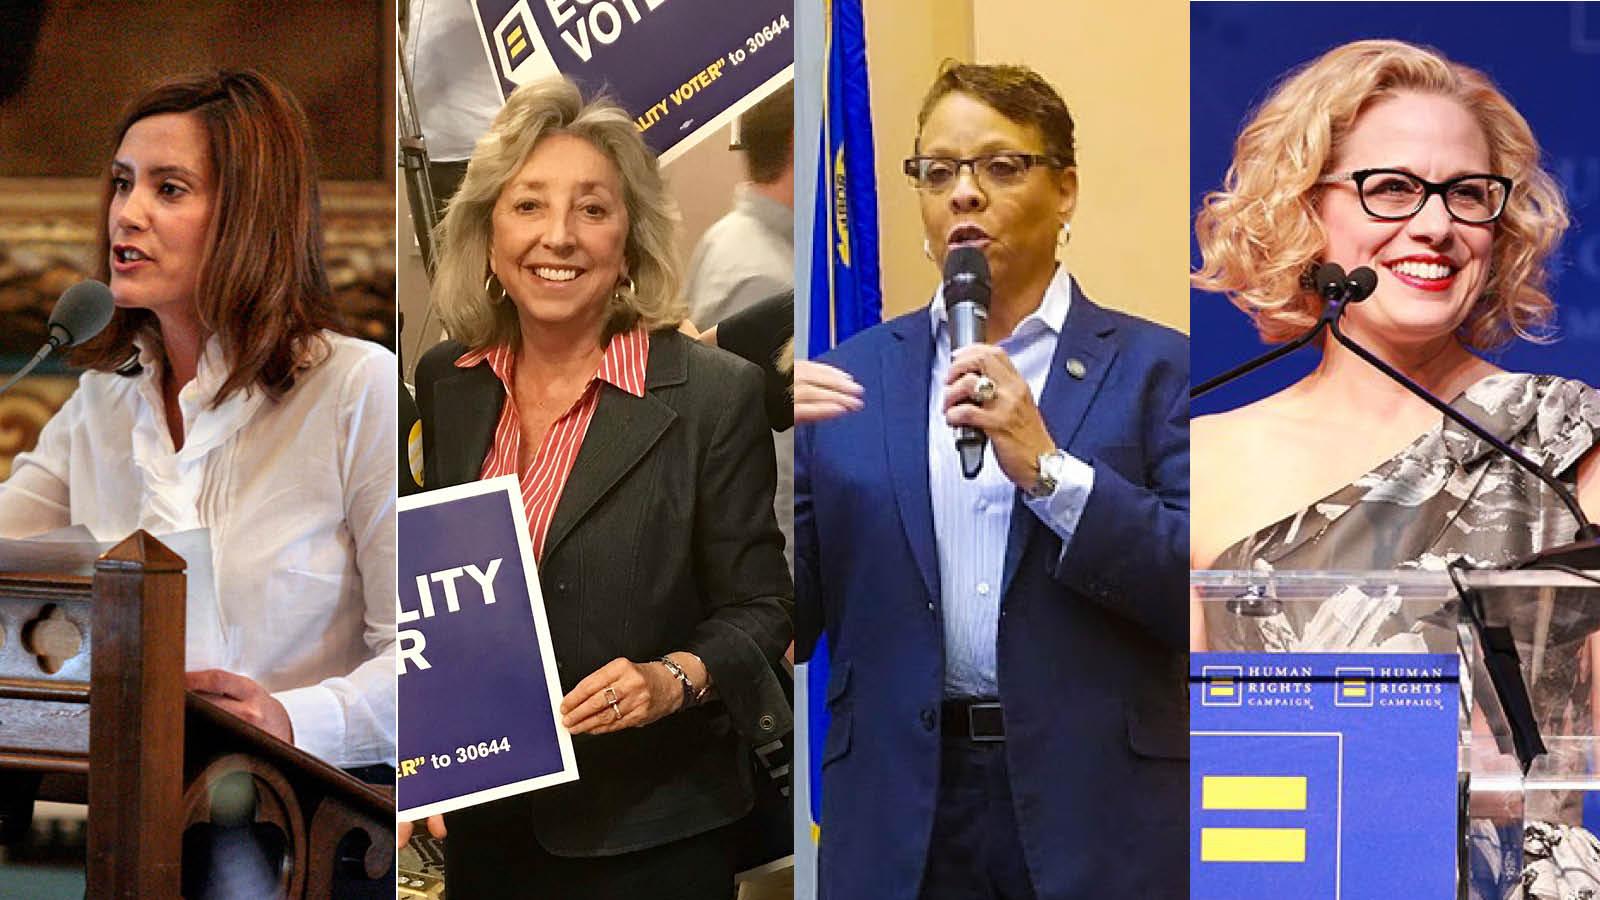 Women on the Rise: Spotlight on LGBTQ Leaders & Allies